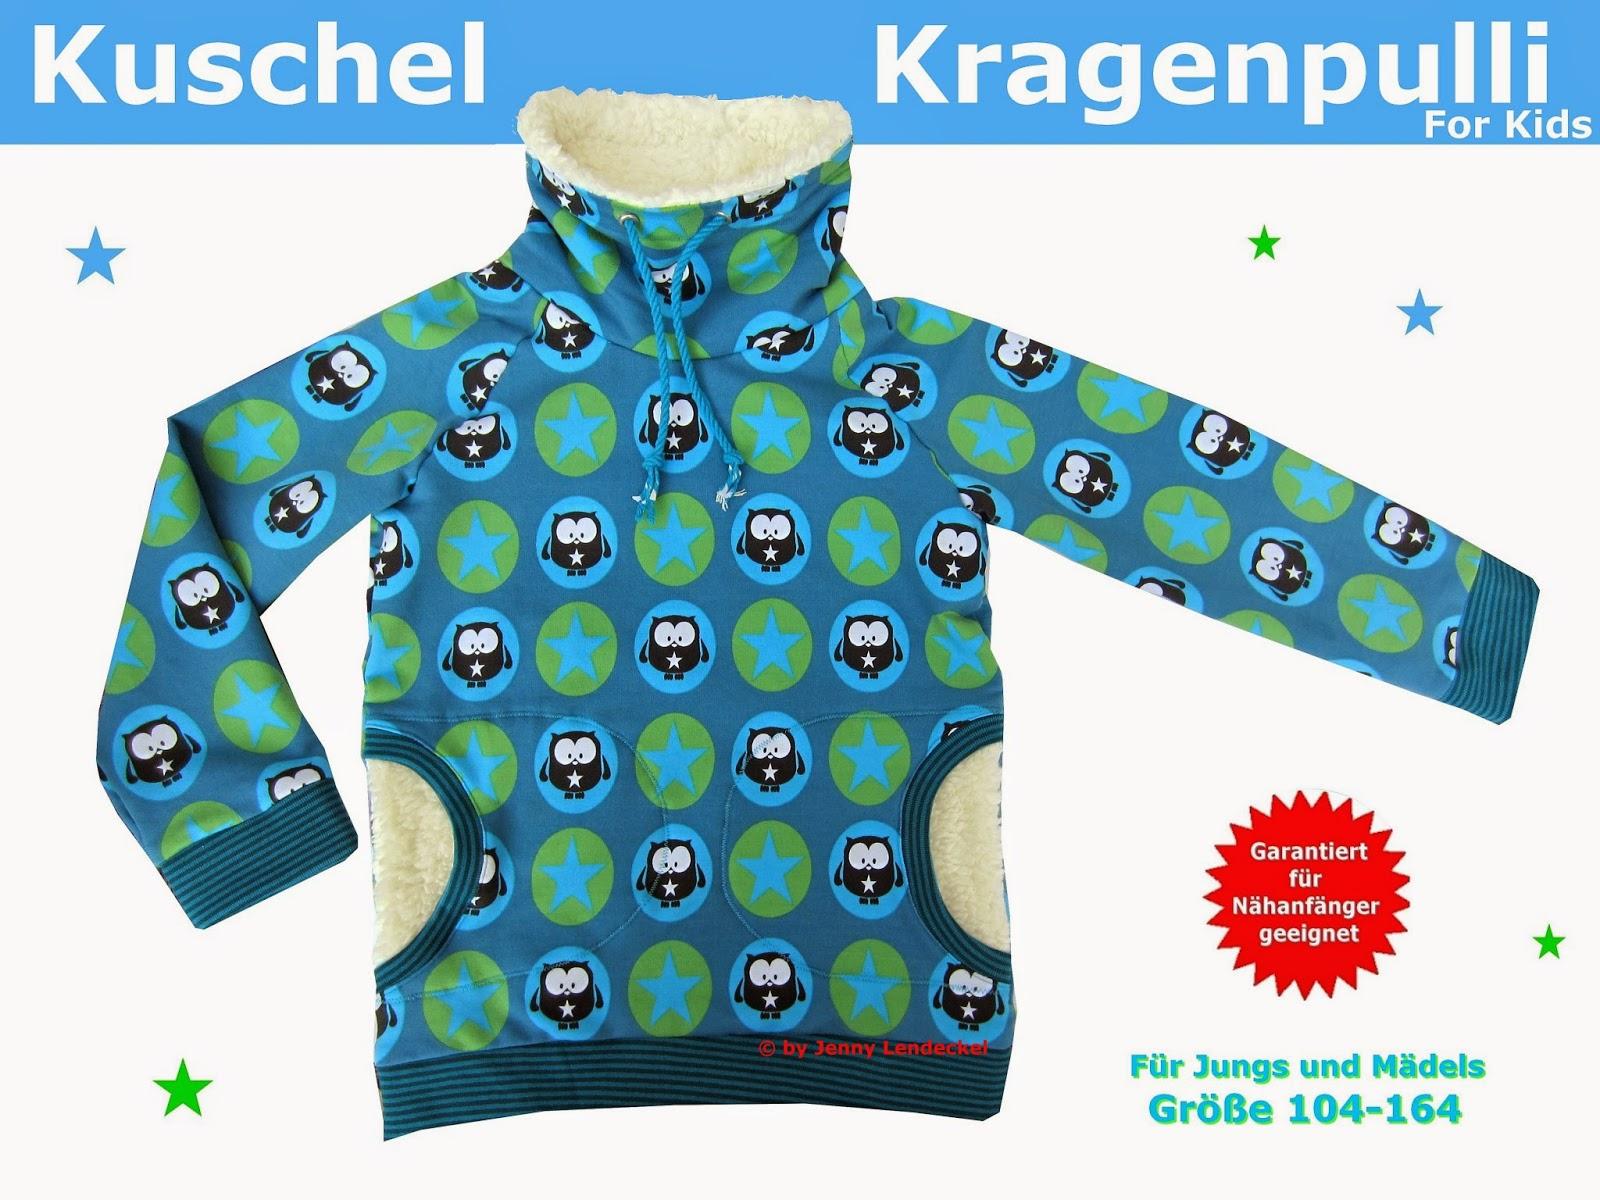 http://de.dawanda.com/product/68731179-Kuschel-Kragenpulli-fuer-Kinder-Schnittmuster